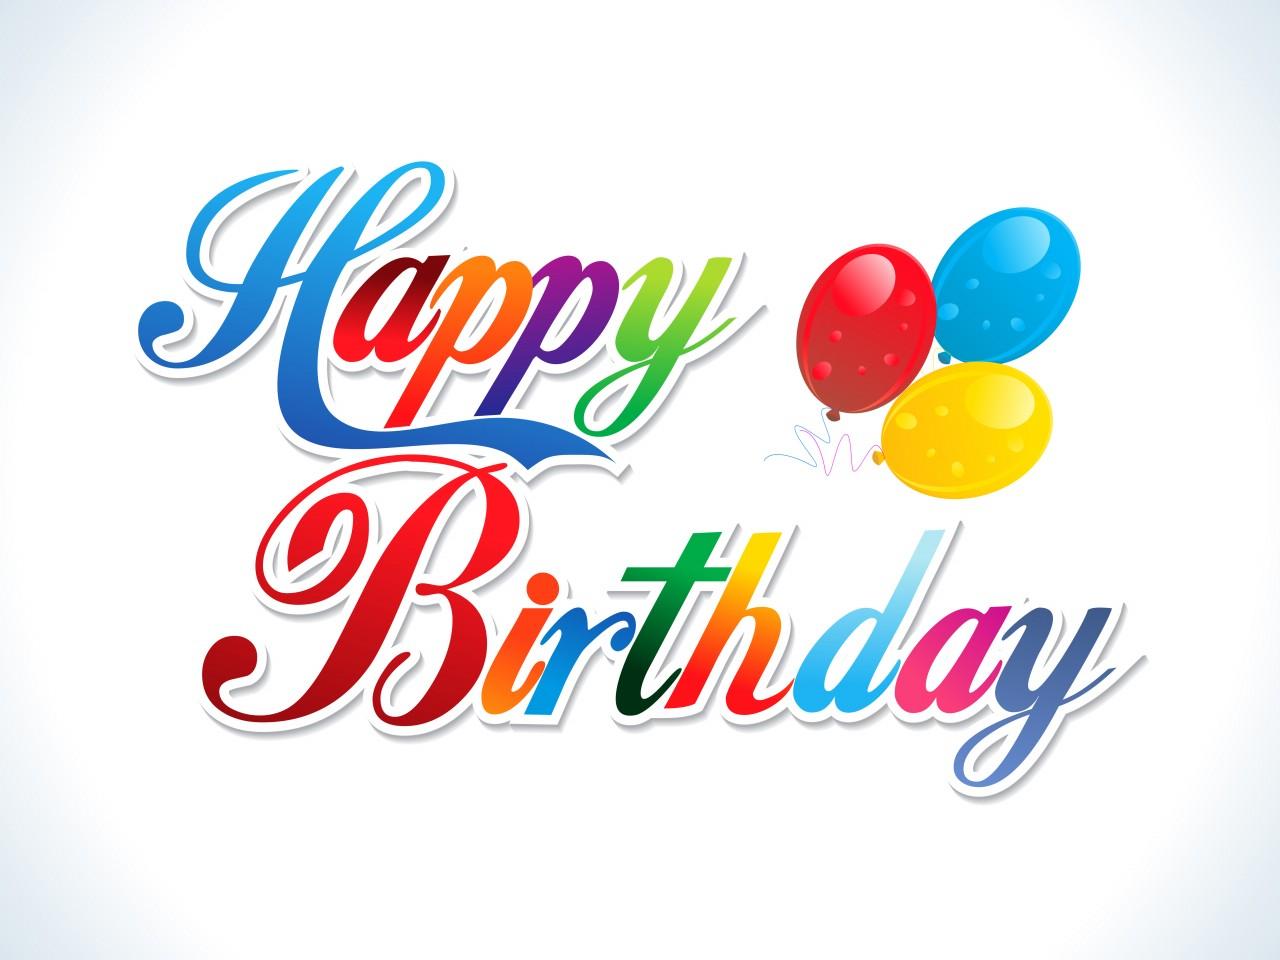 Best Happy Birthday Background HD Wallpapers 14432 Wallpaper 1280x960